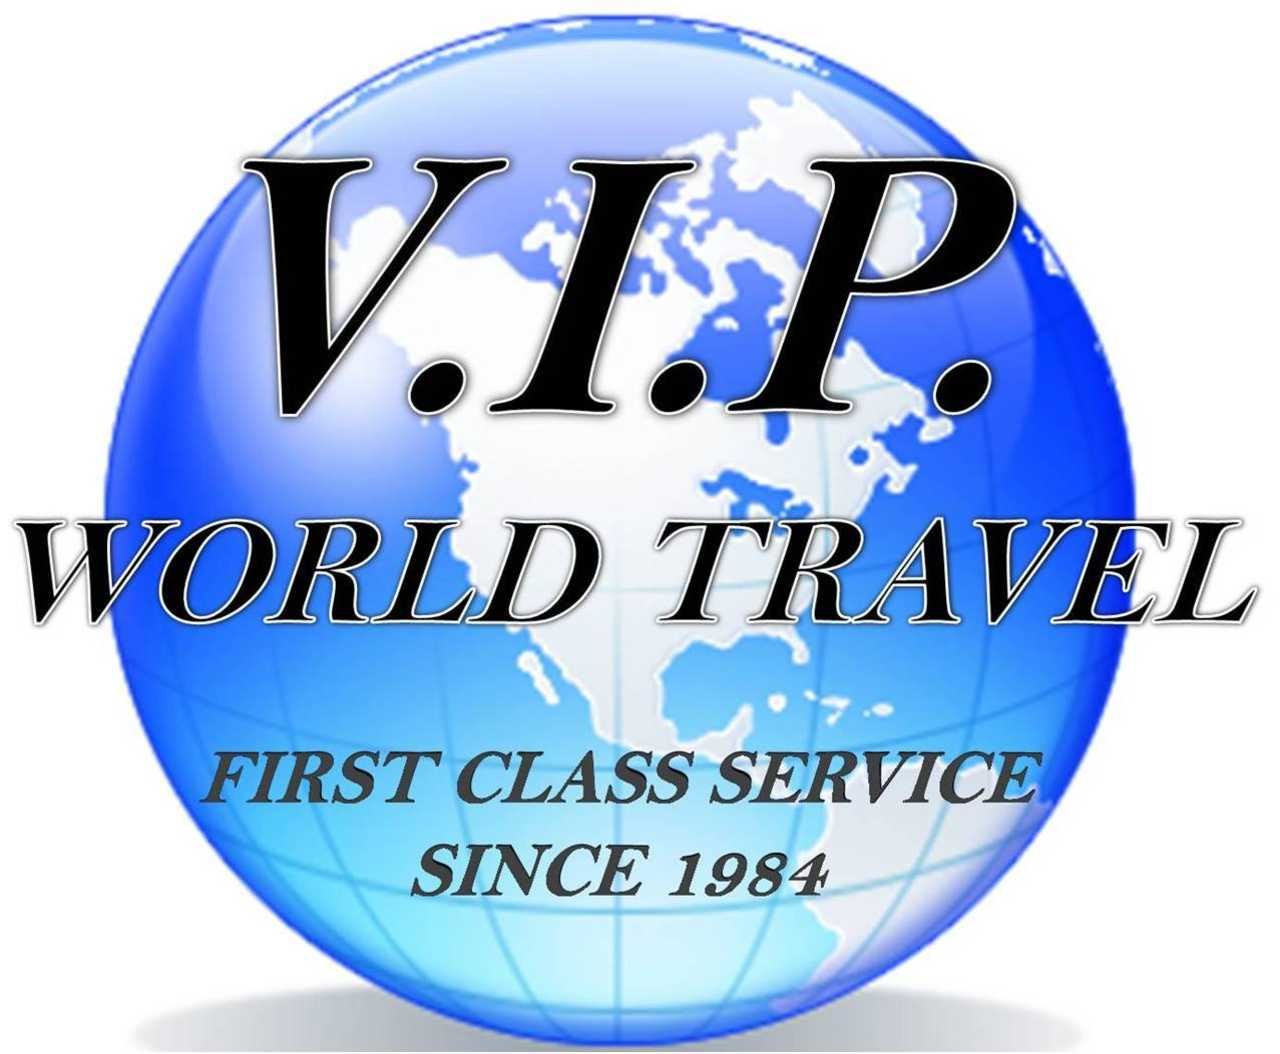 VIP World Travel - Travel - Travel Tours in Sarasota FL